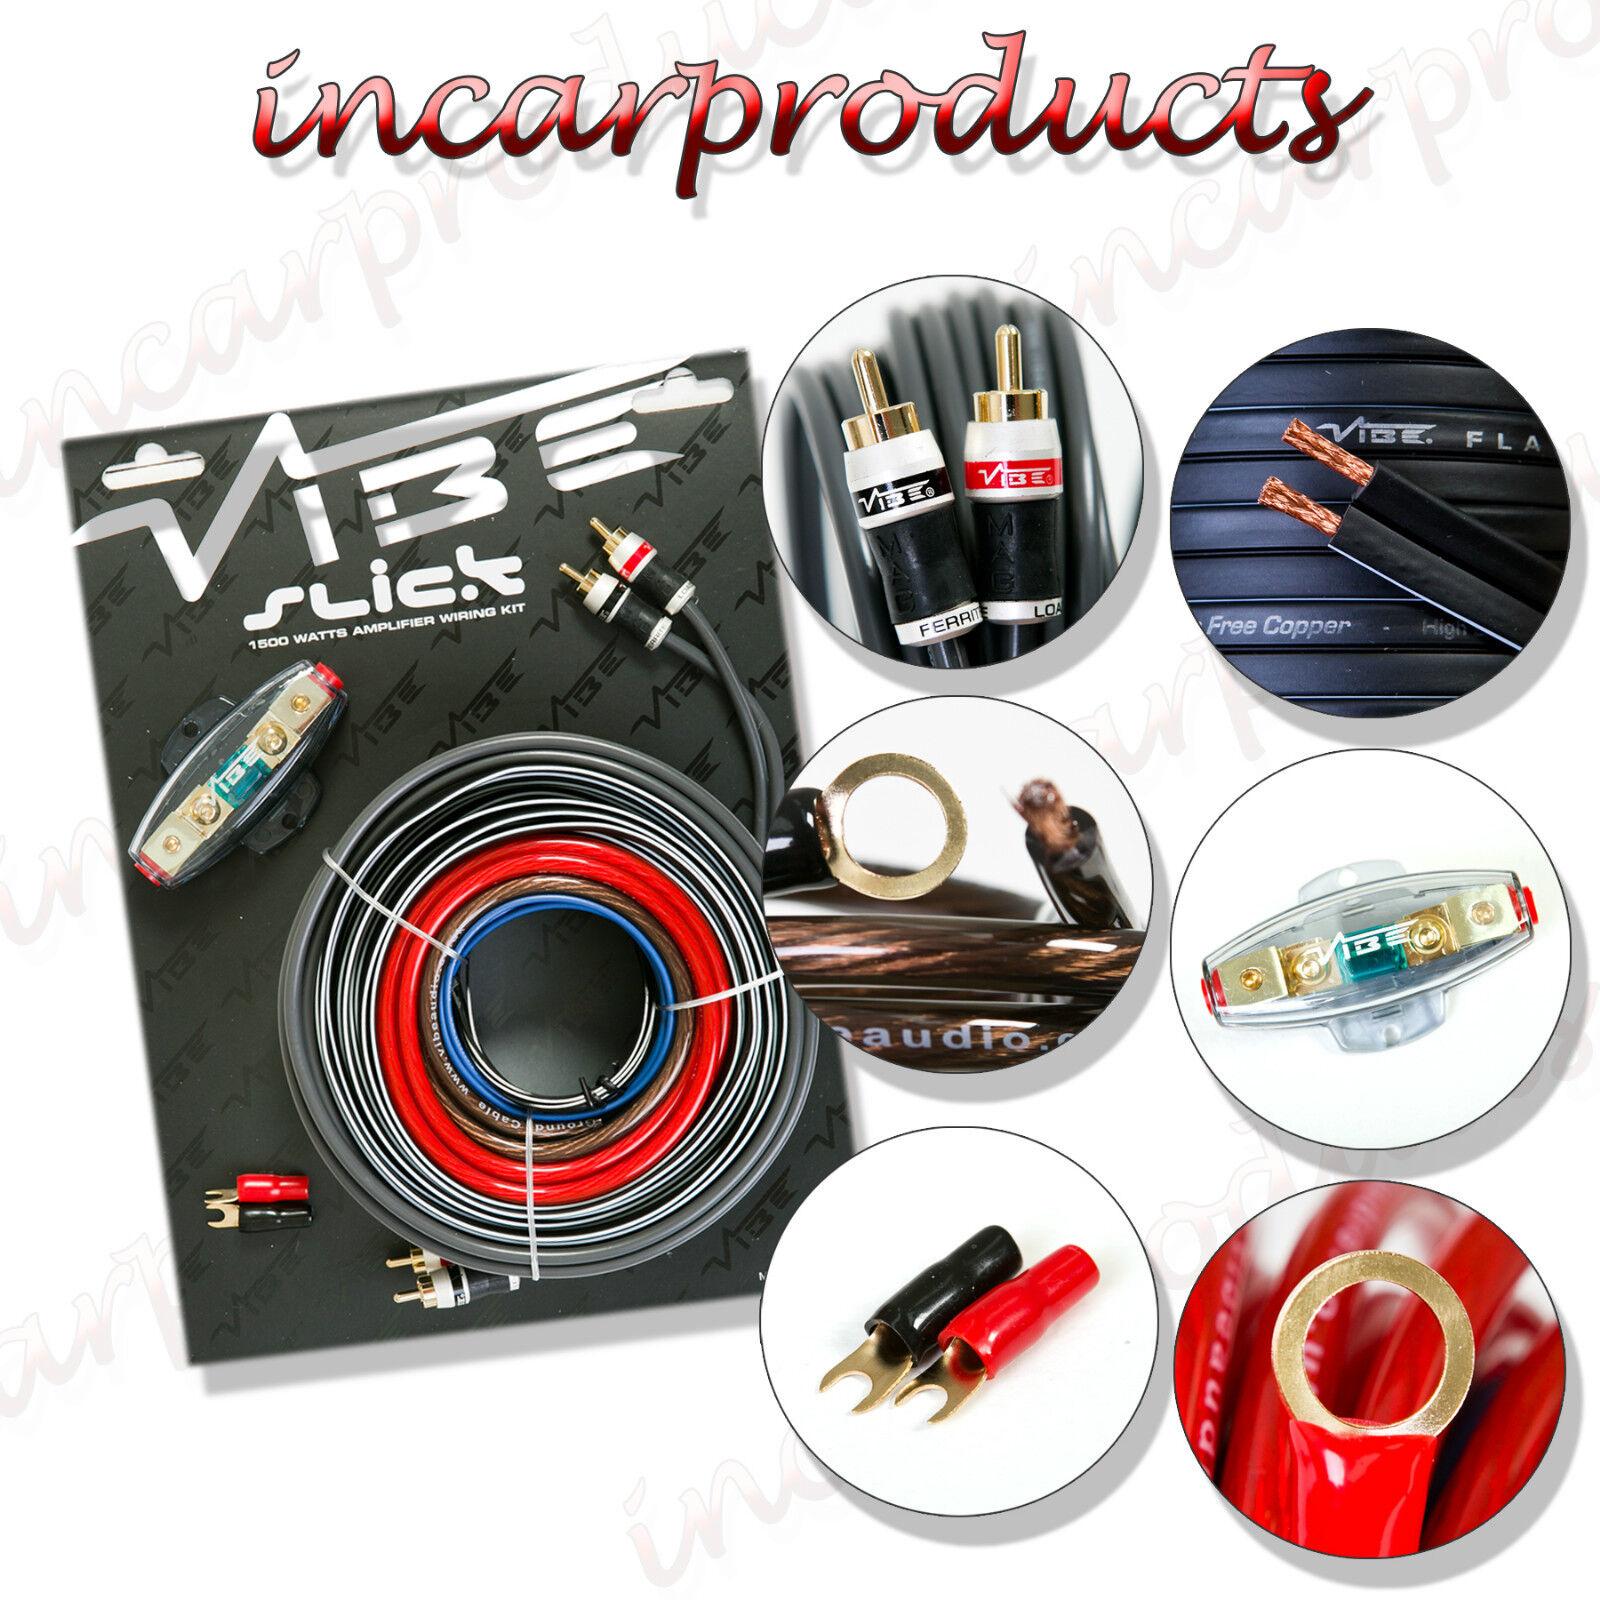 Vibe 8 Awg Gauage Slick Vsawk8 V1 1500w Amp Amplifier